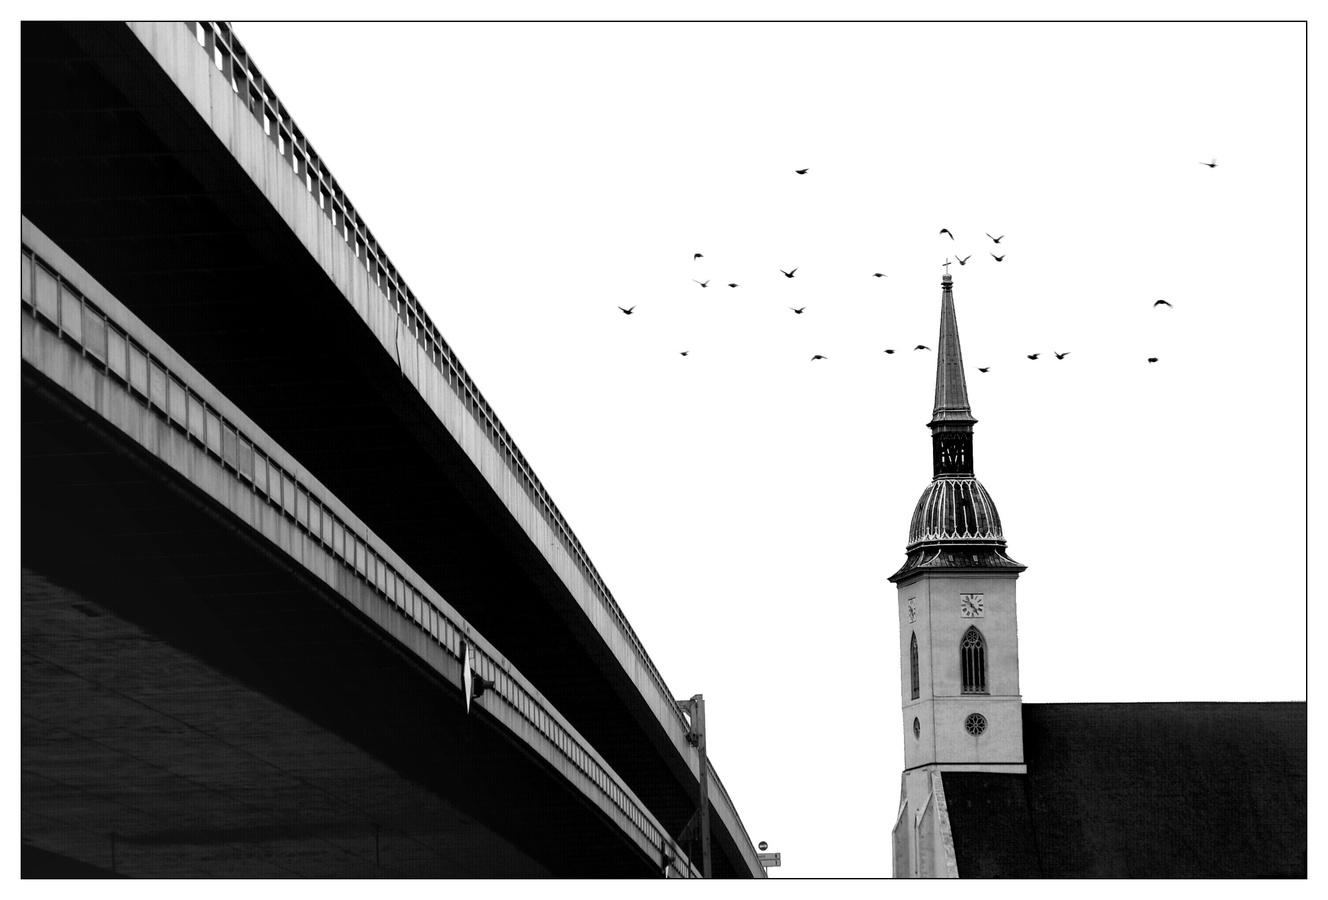 čierne na bielom: most ku spáse